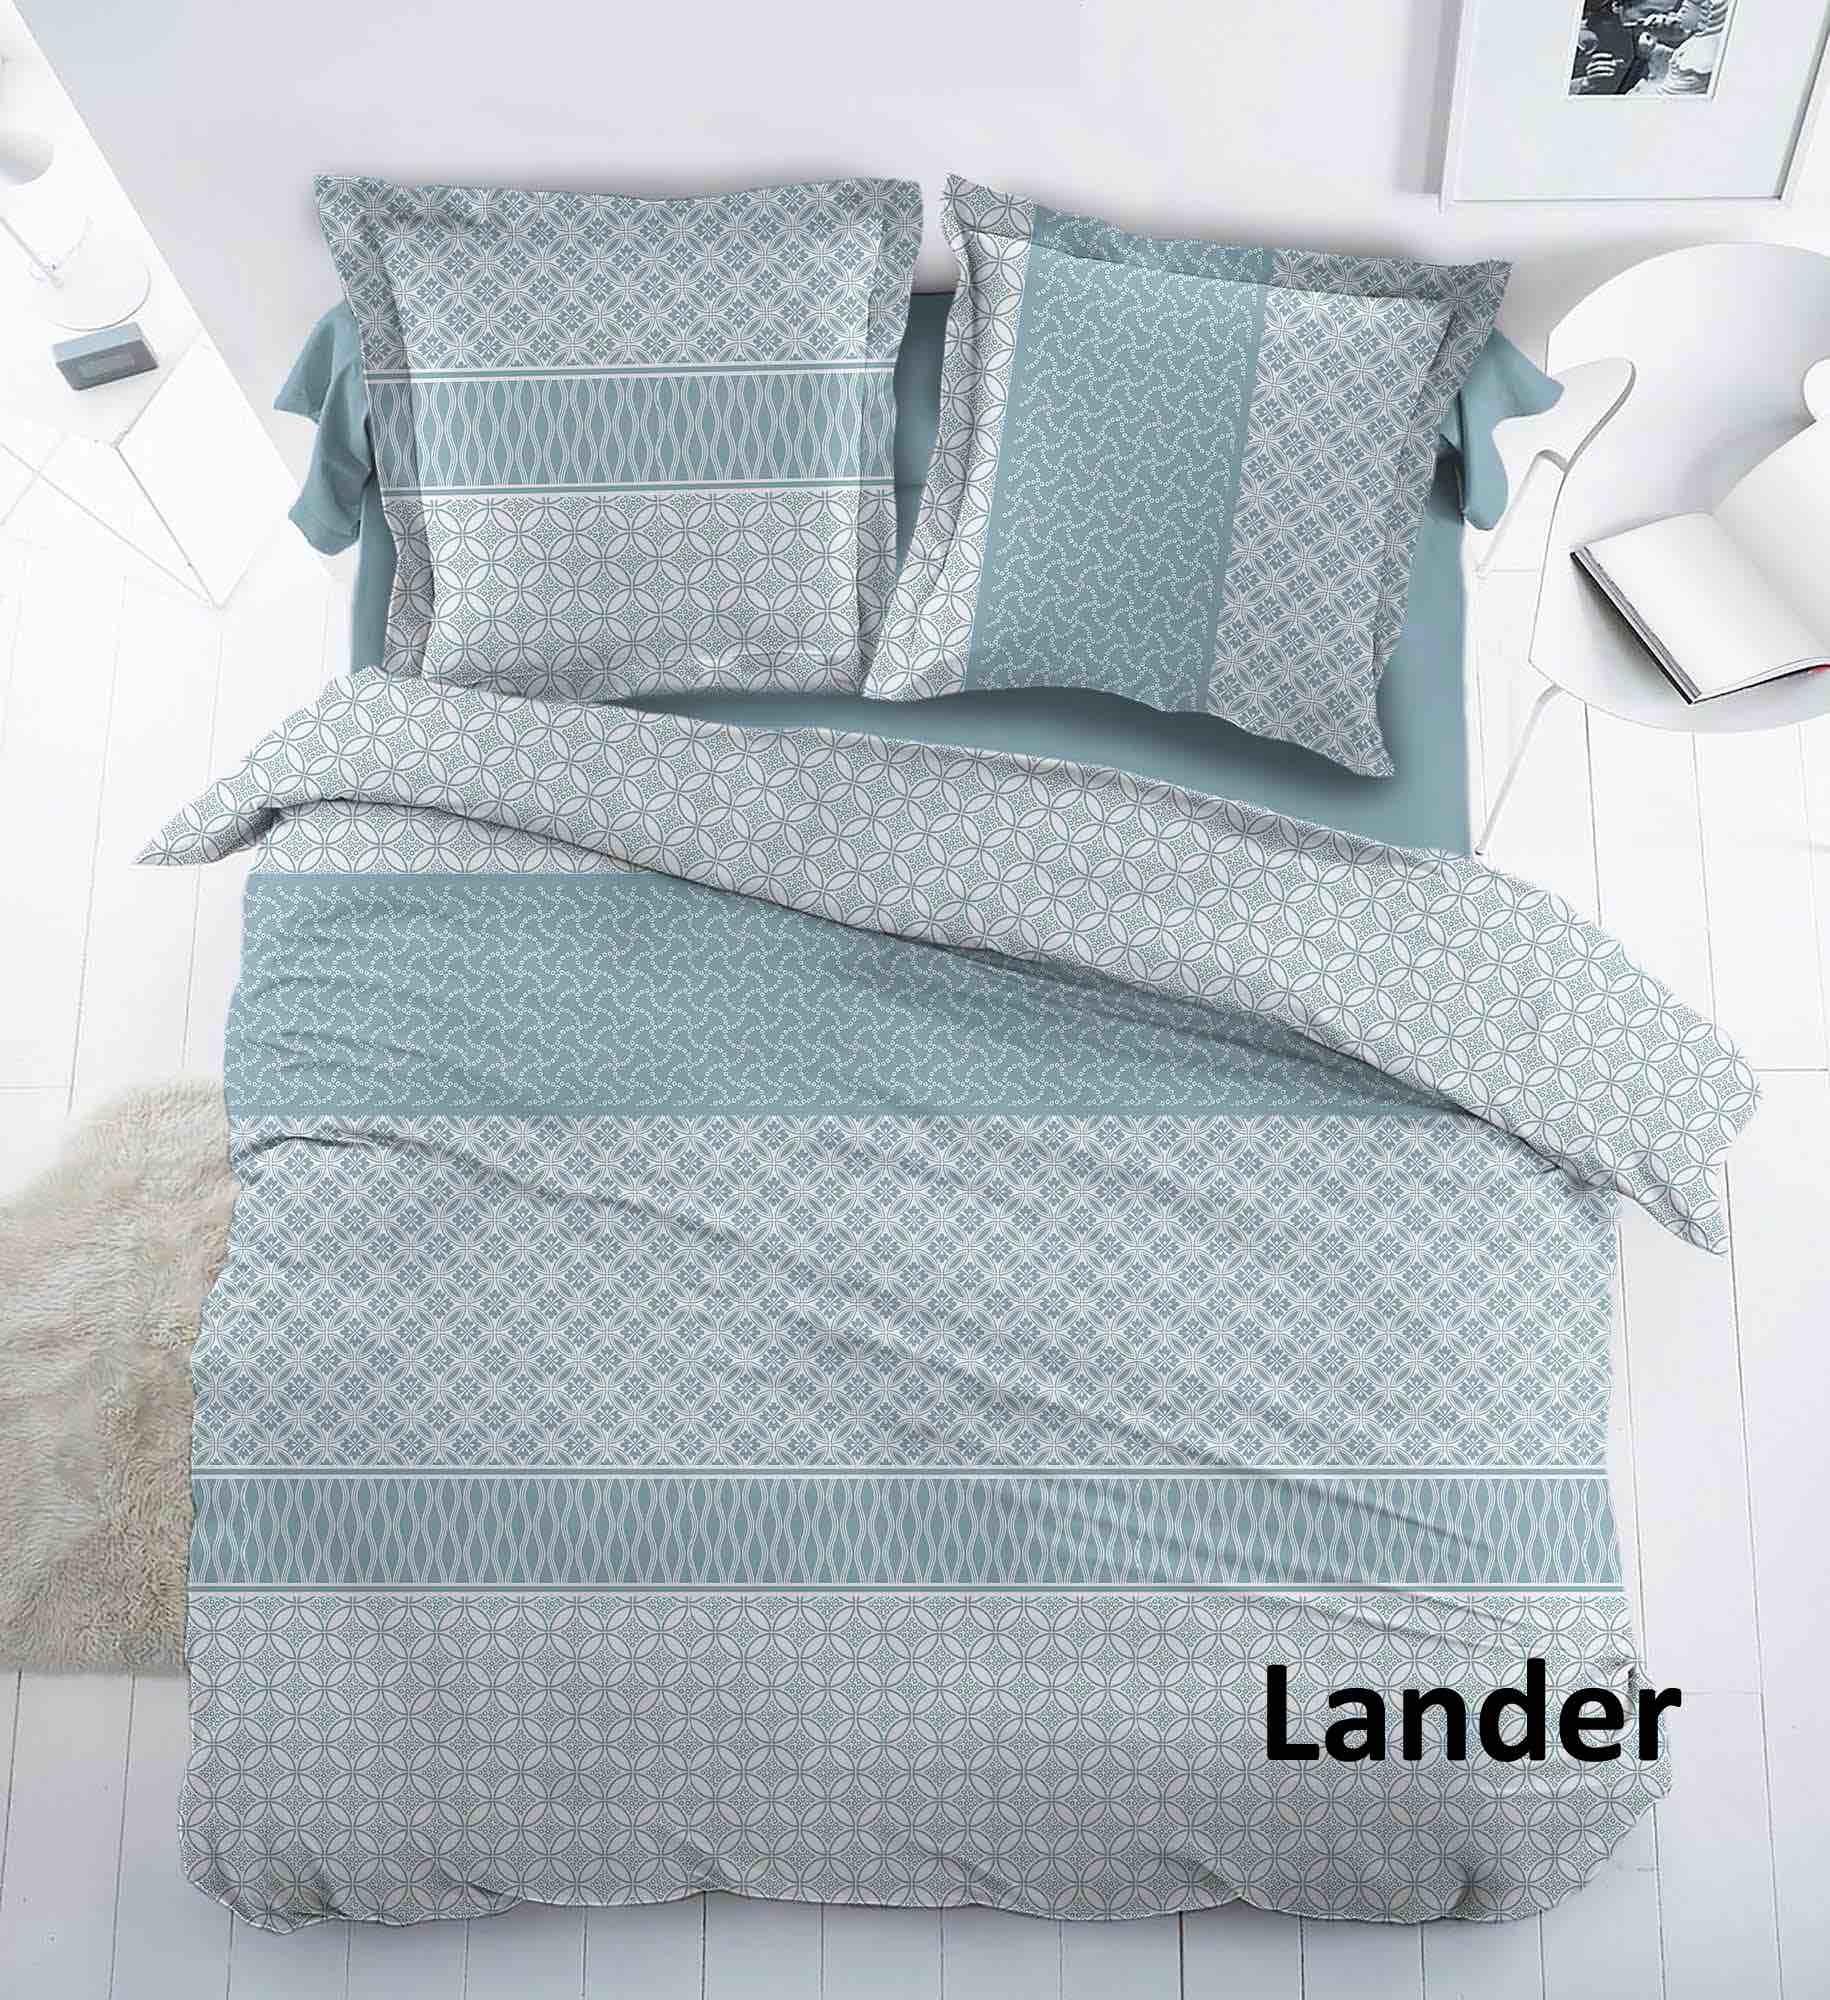 Cottons Dekbedovertrek Flanel Lander